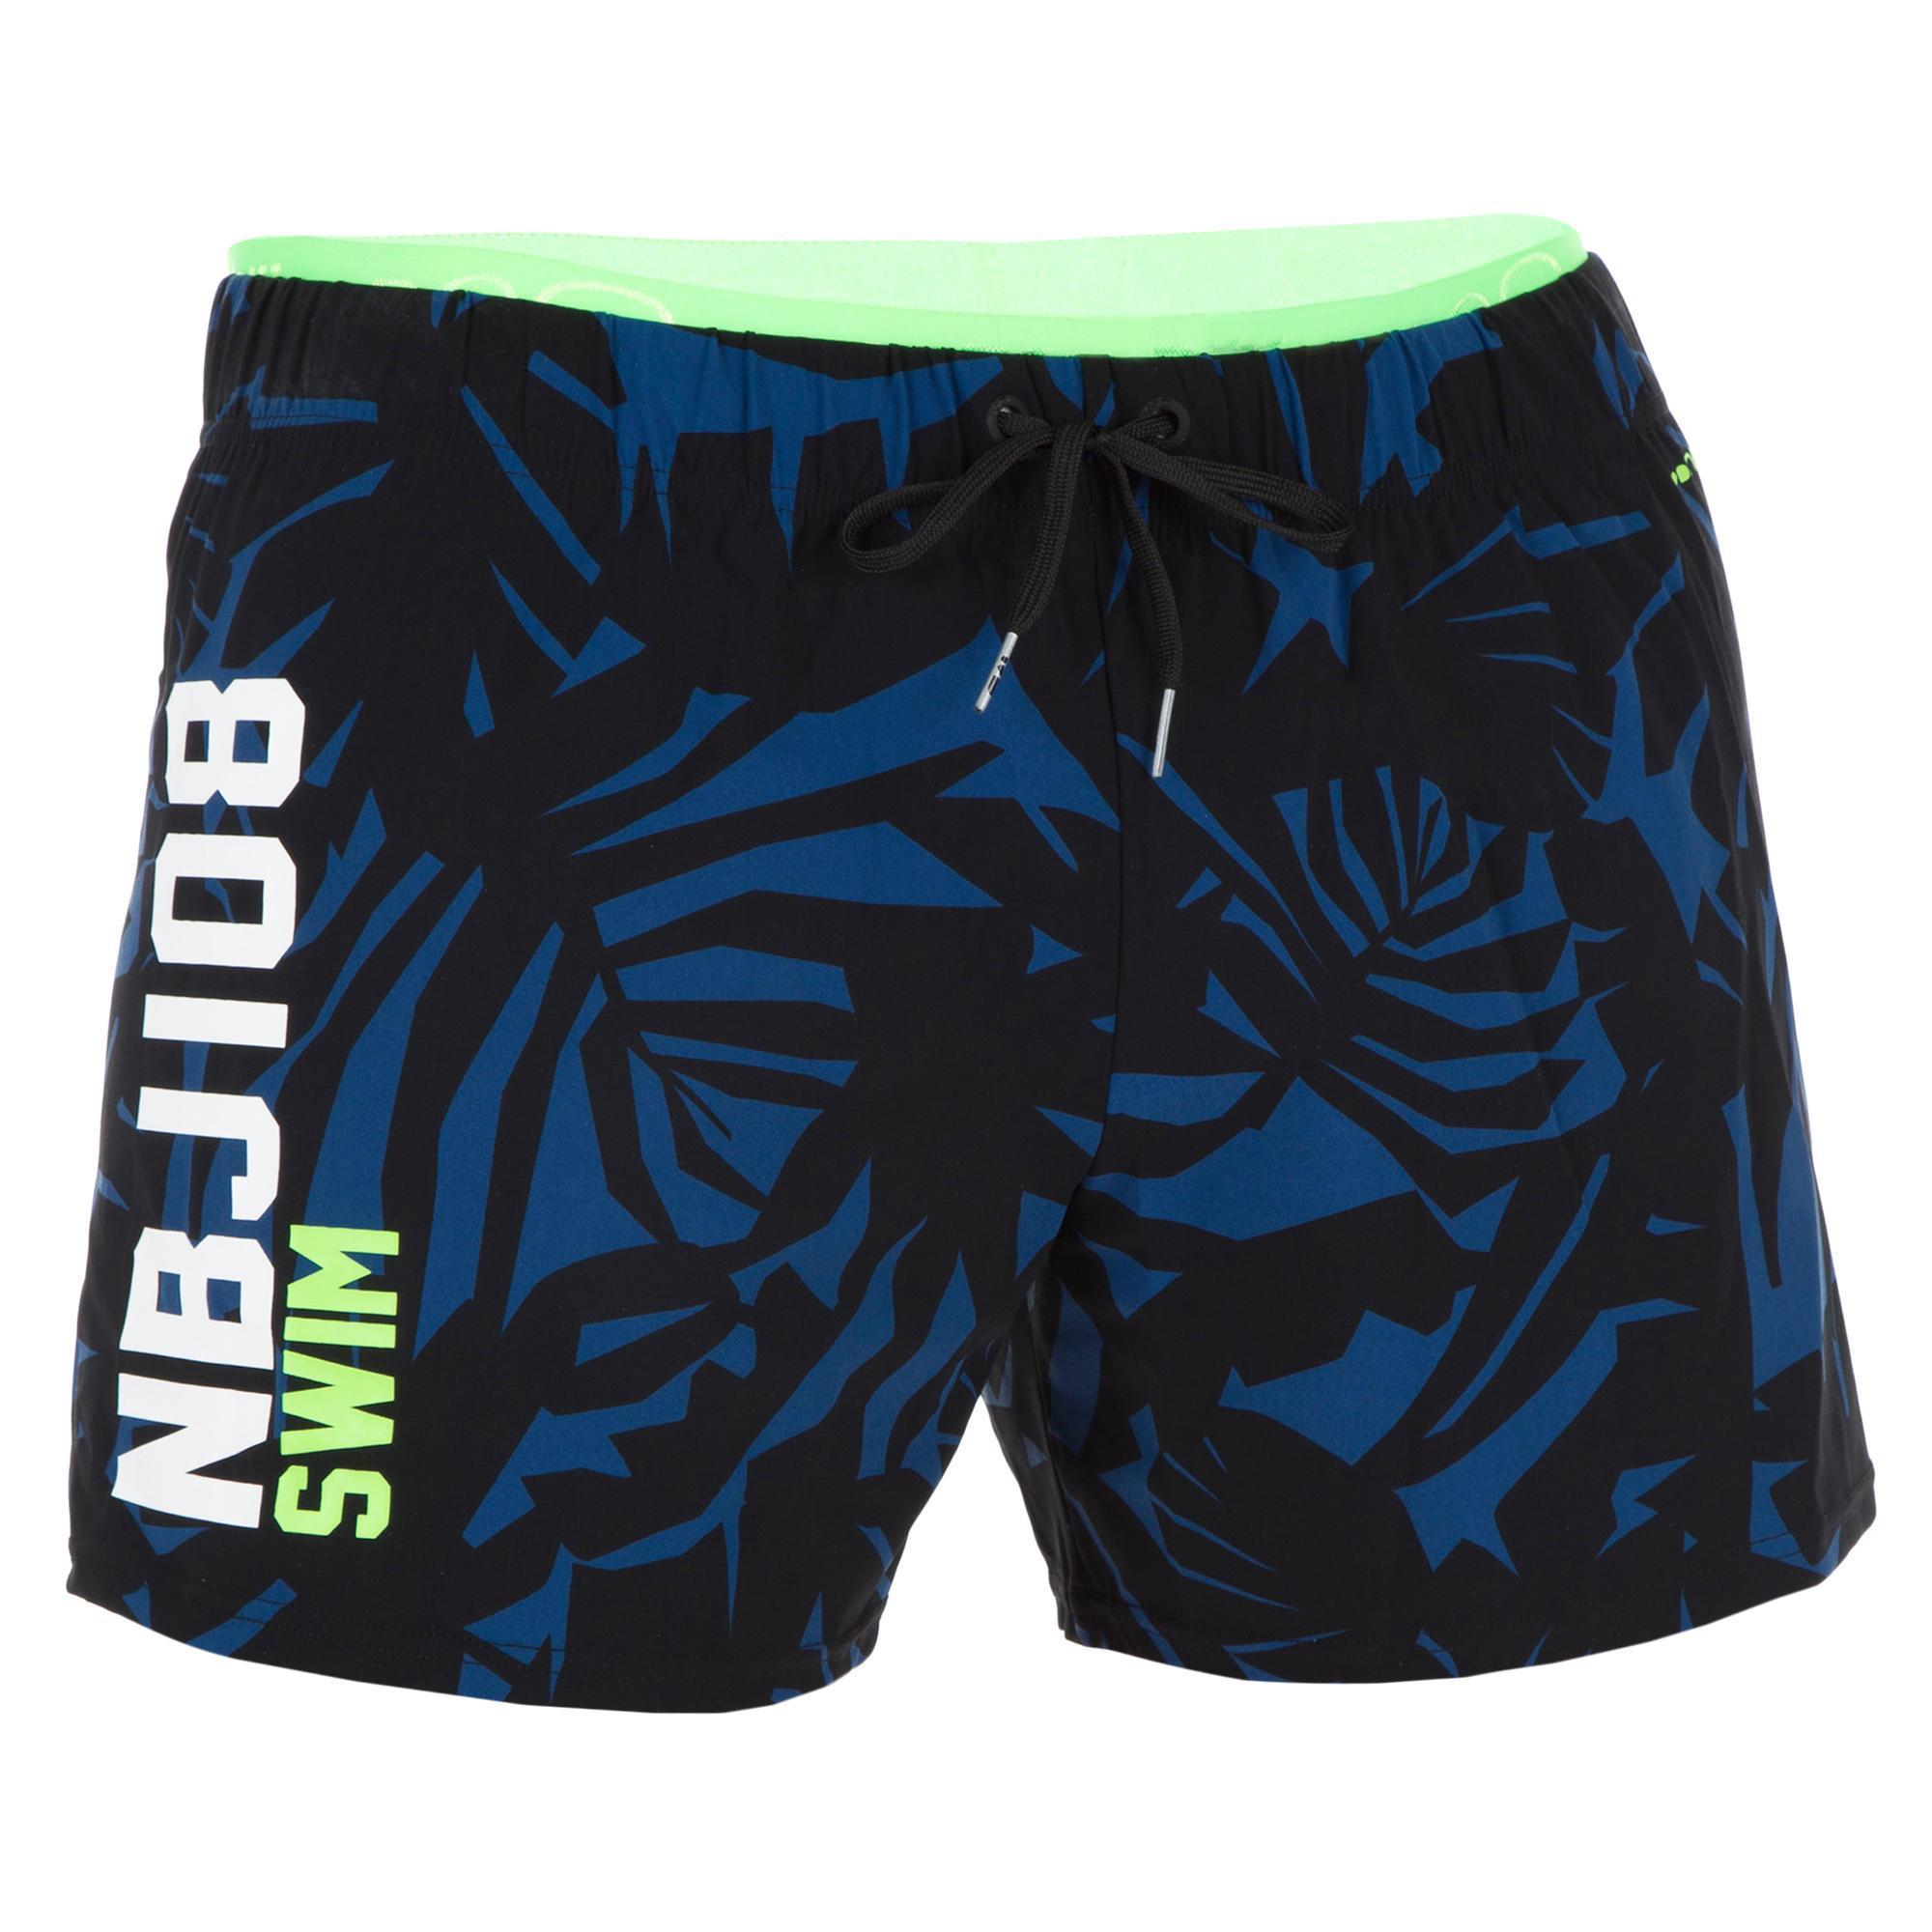 Schwimmshorts 100 CourtAll Lia NBJI Herren schwarz/blau | Sportbekleidung > Sporthosen > Sportshorts | Nabaiji